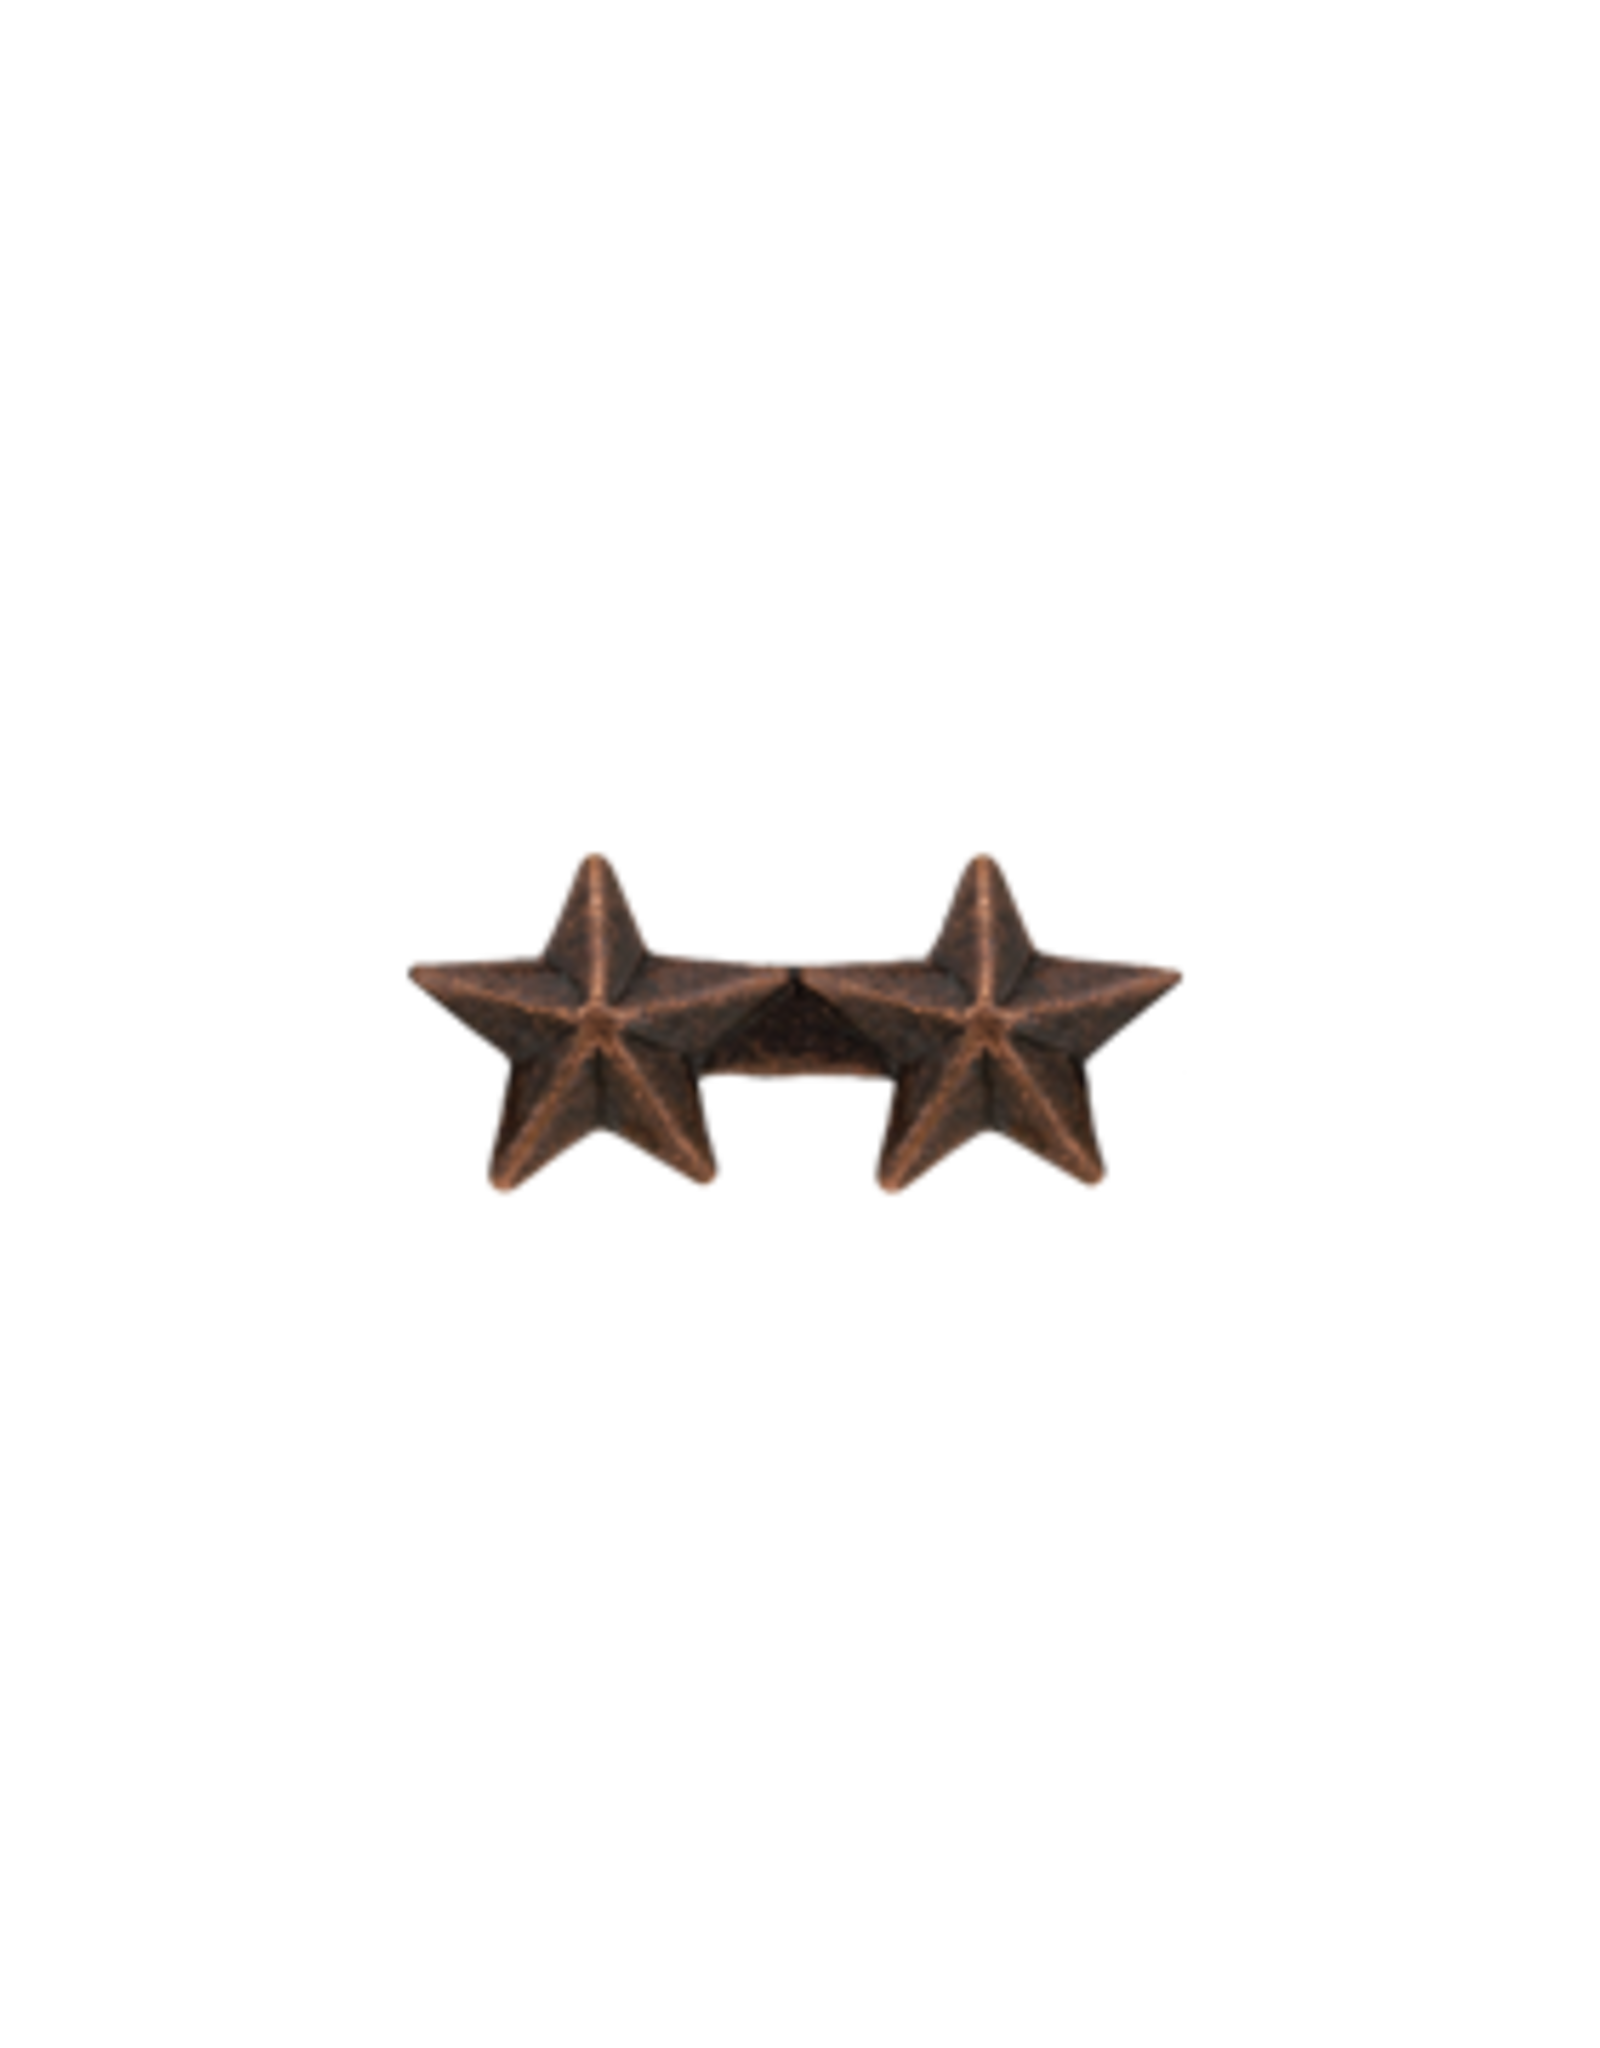 2 Star Cluster